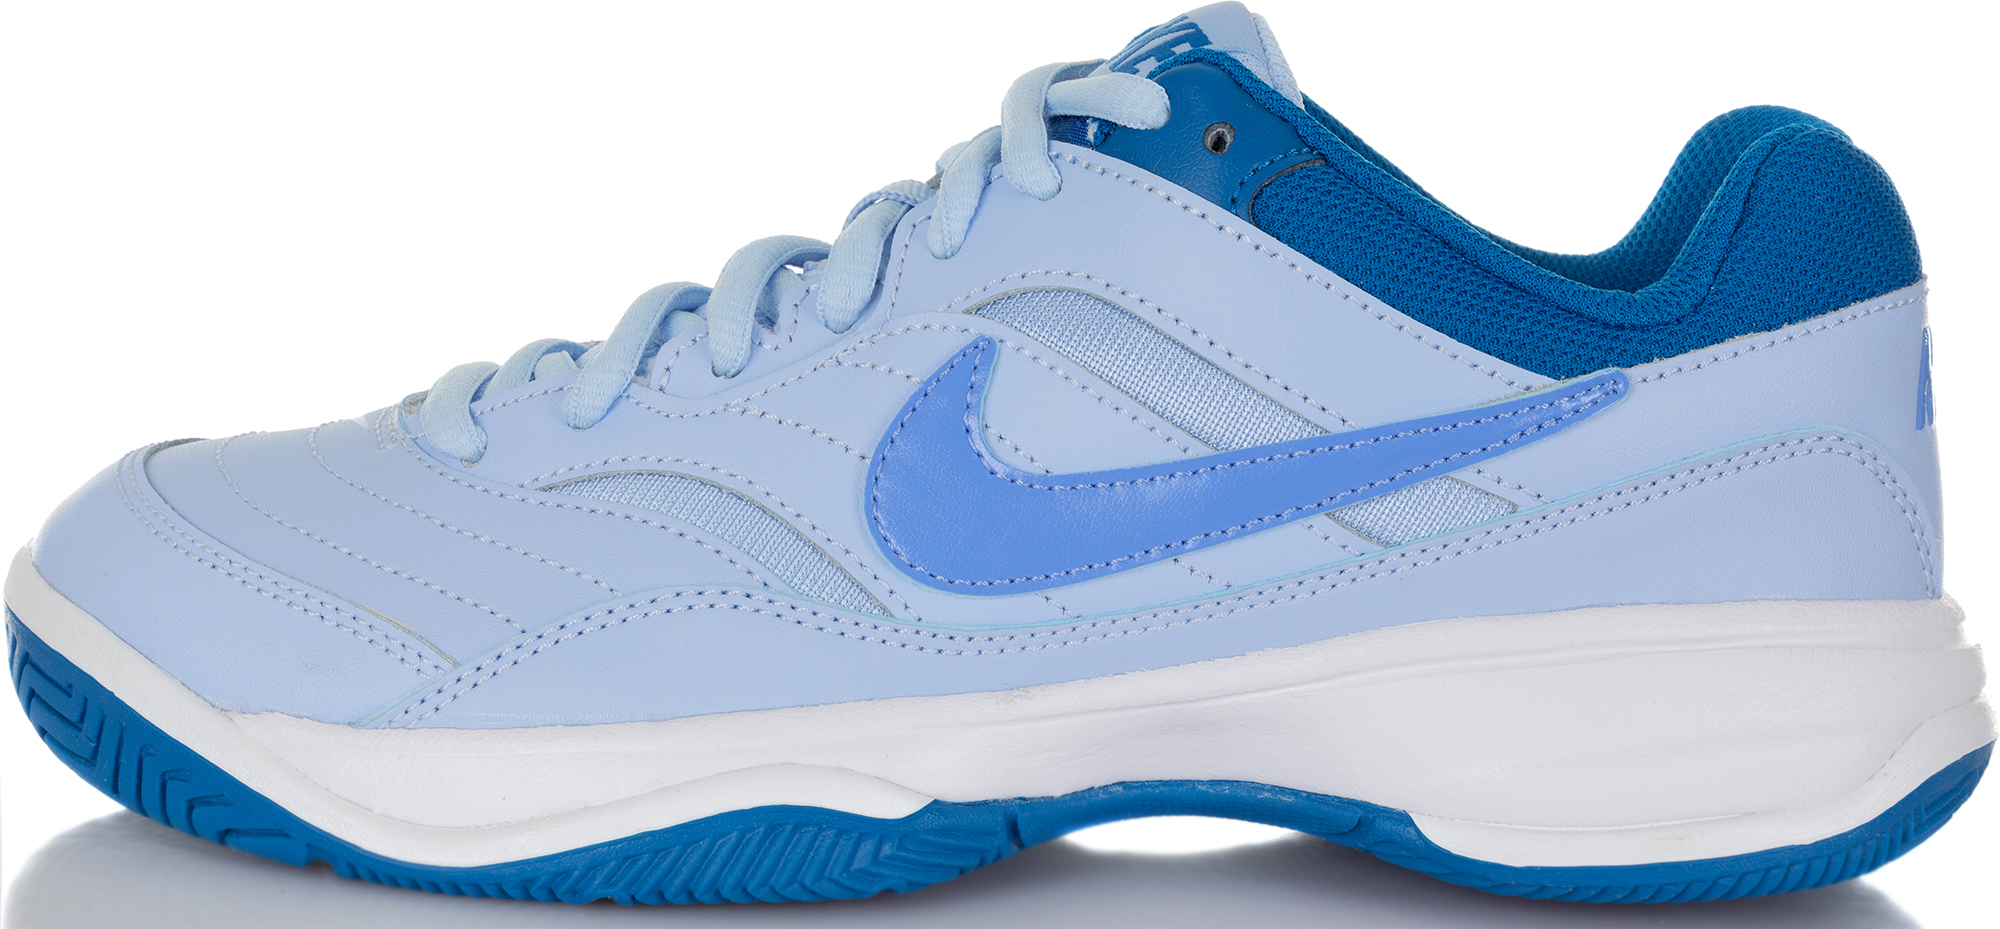 Nike Кроссовки женские Nike Court Lite, размер 37,5 кроссовки для тенниса мужские nike court lite цвет белый 845021 100 размер 10 5 43 5